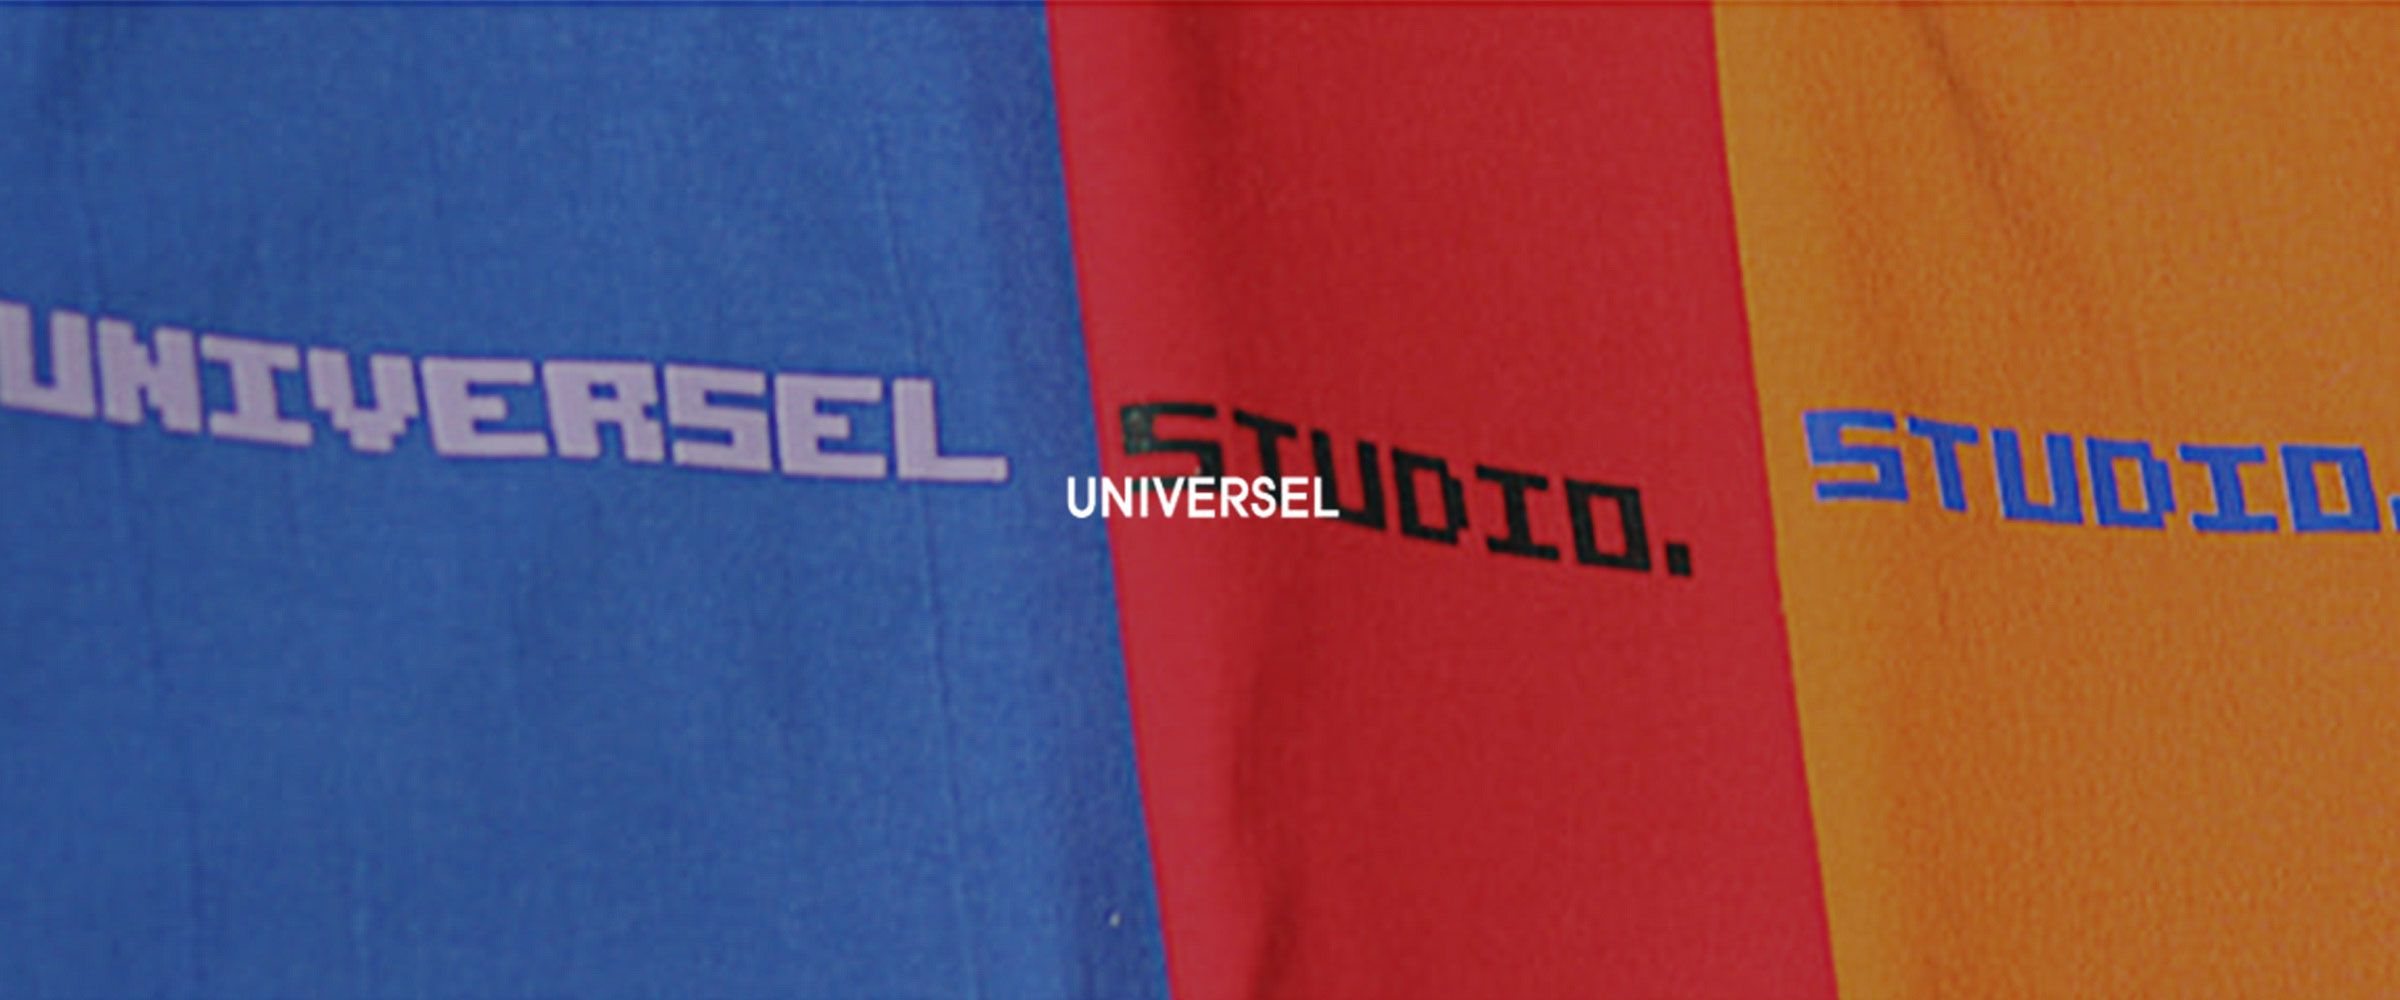 universel.jpg